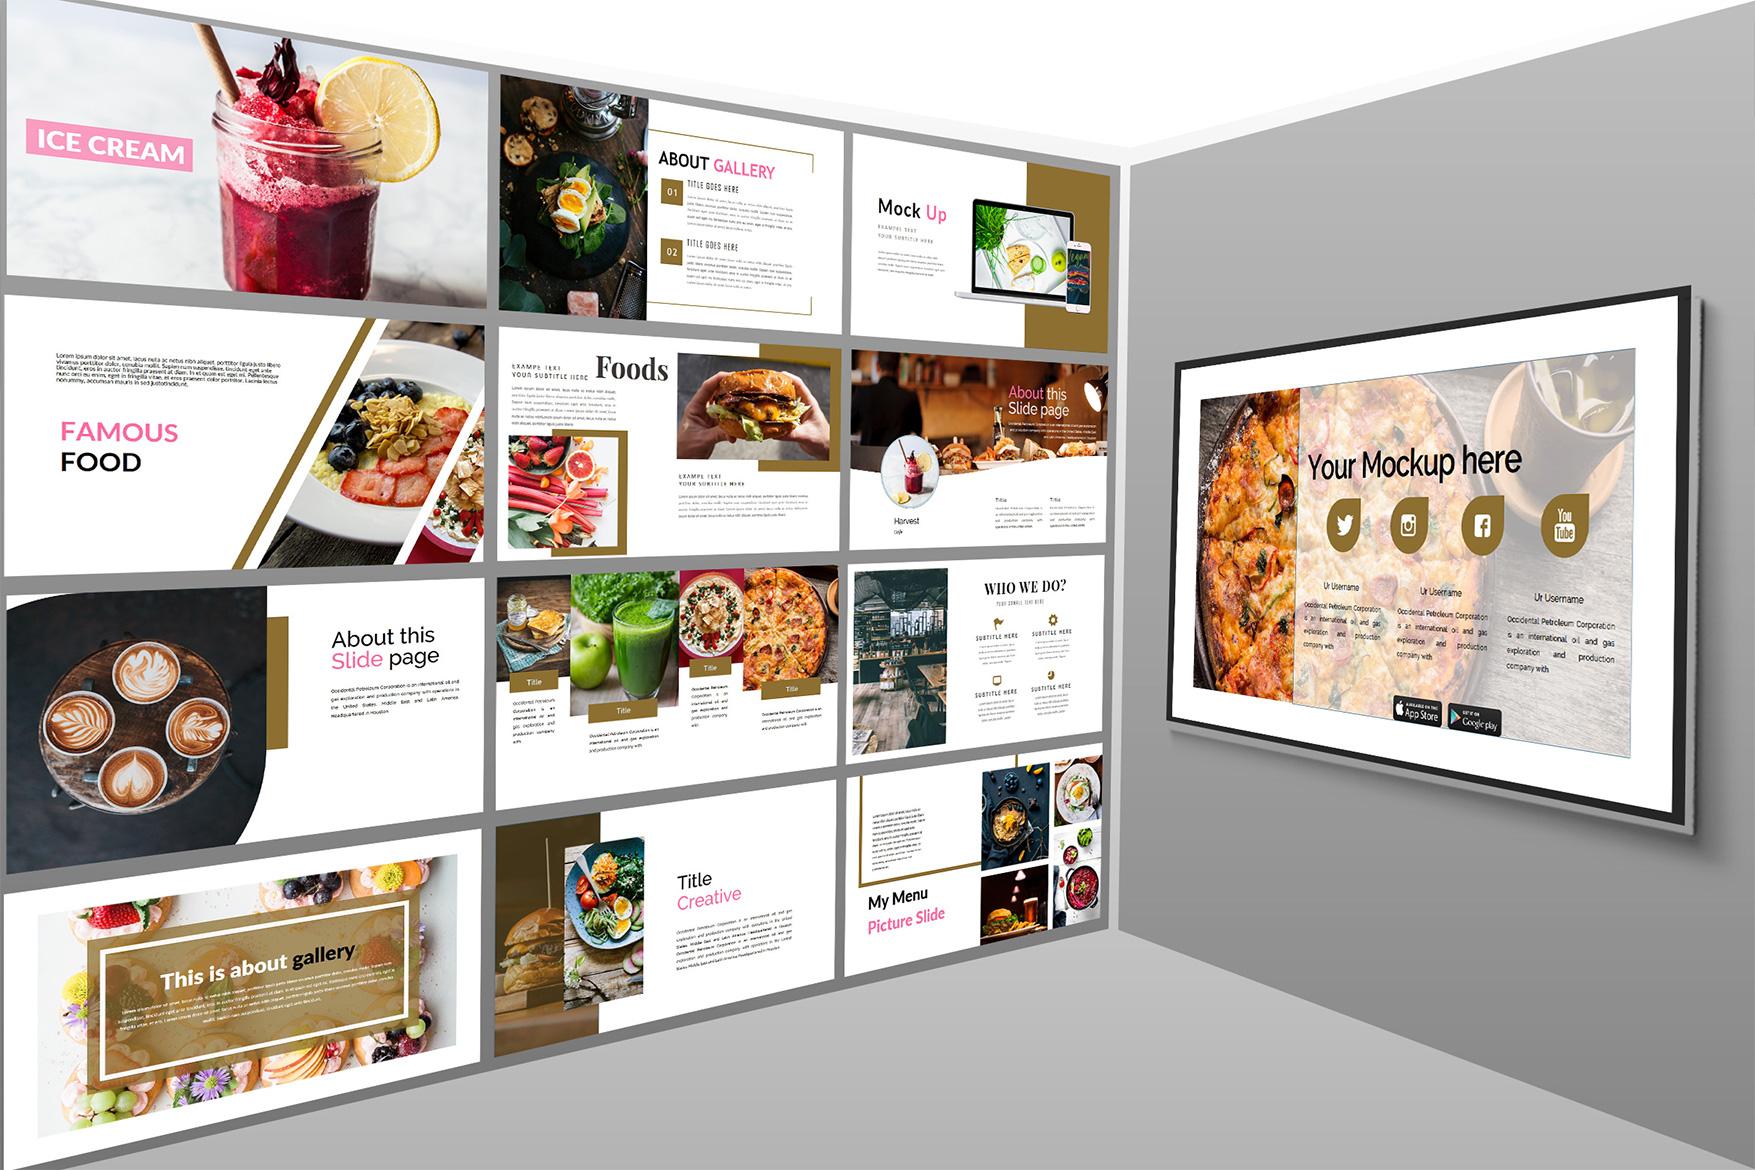 Delicious Food - Google Slides Presentation example image 6